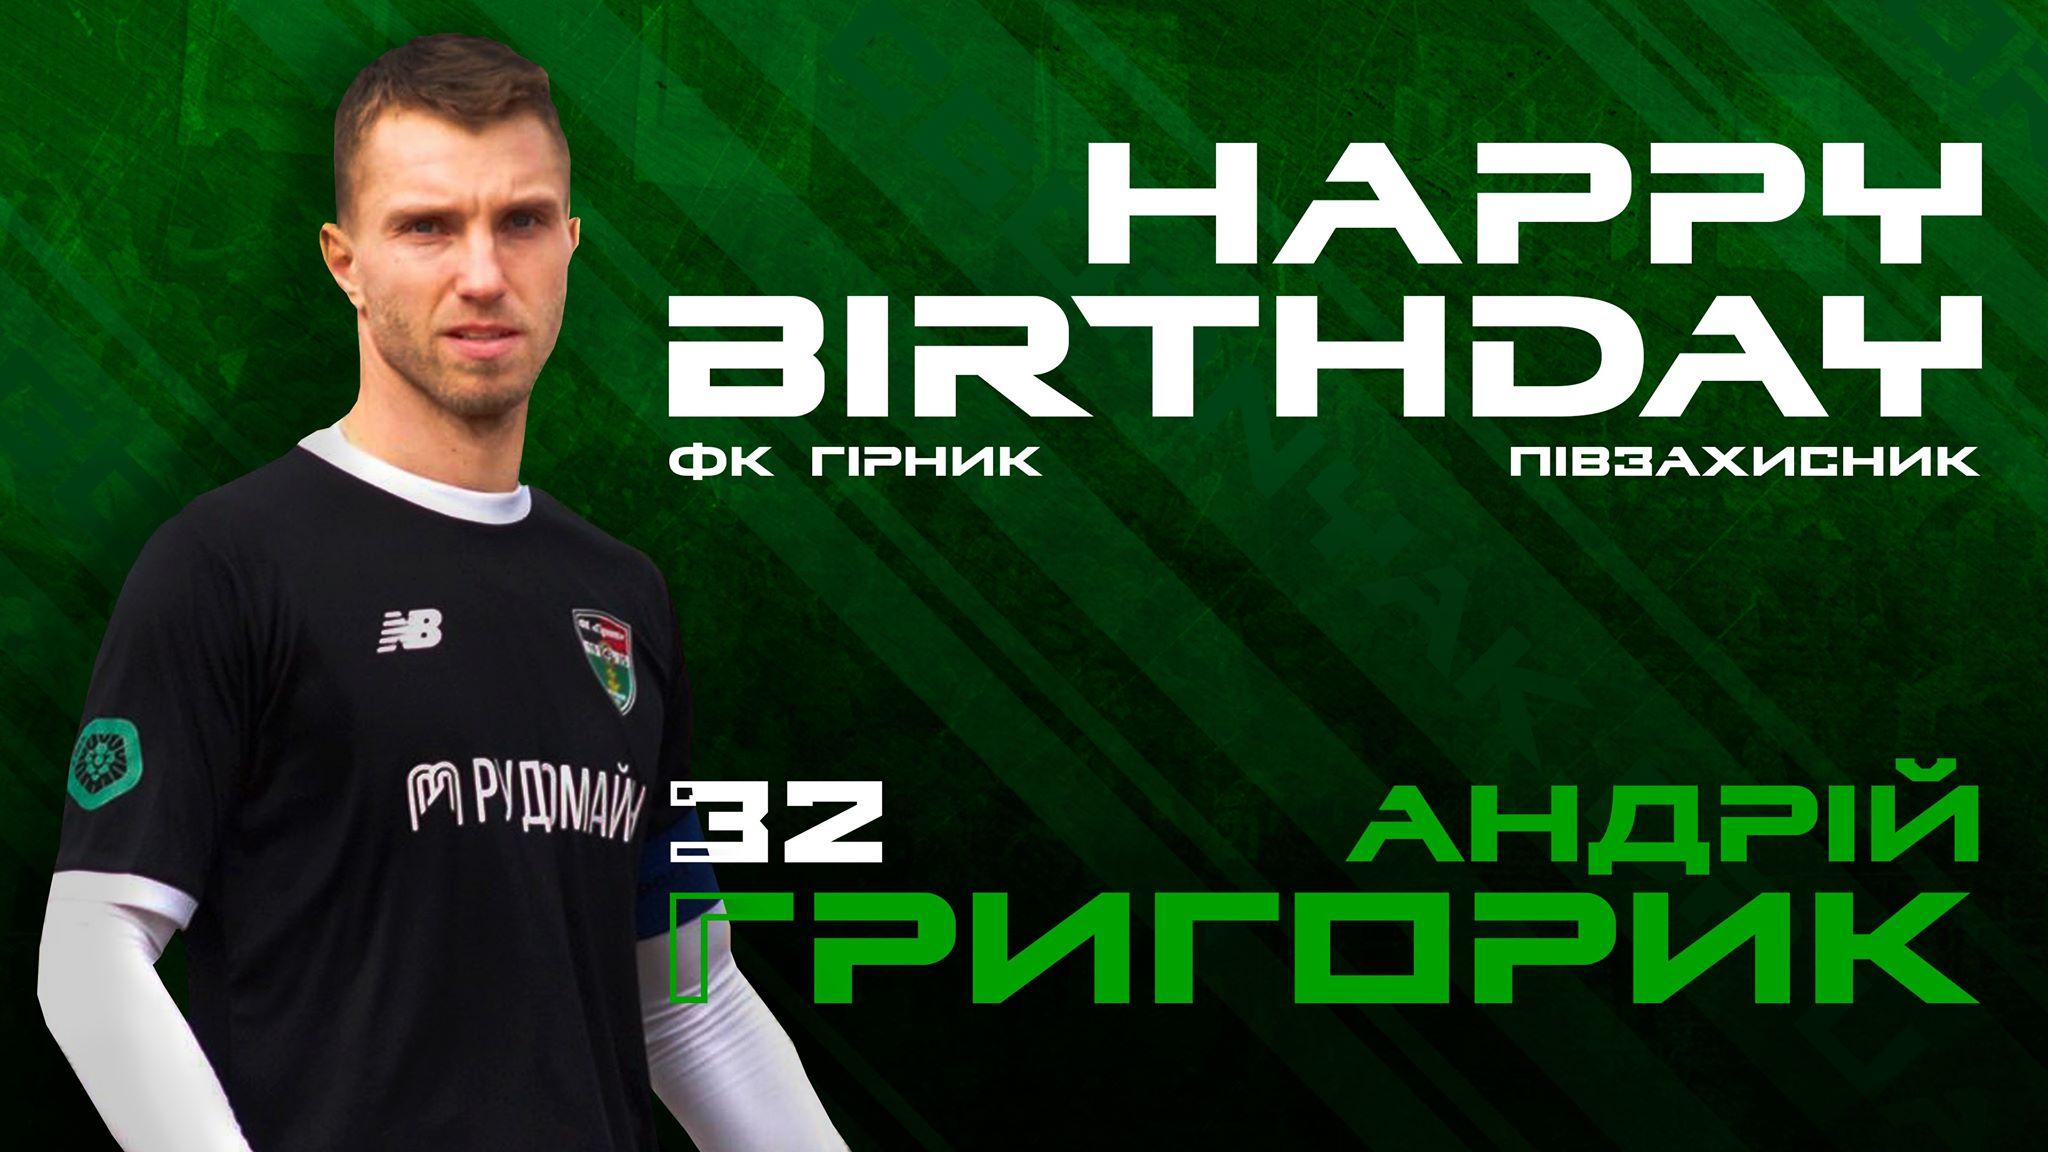 Андрею Григорику - 32!